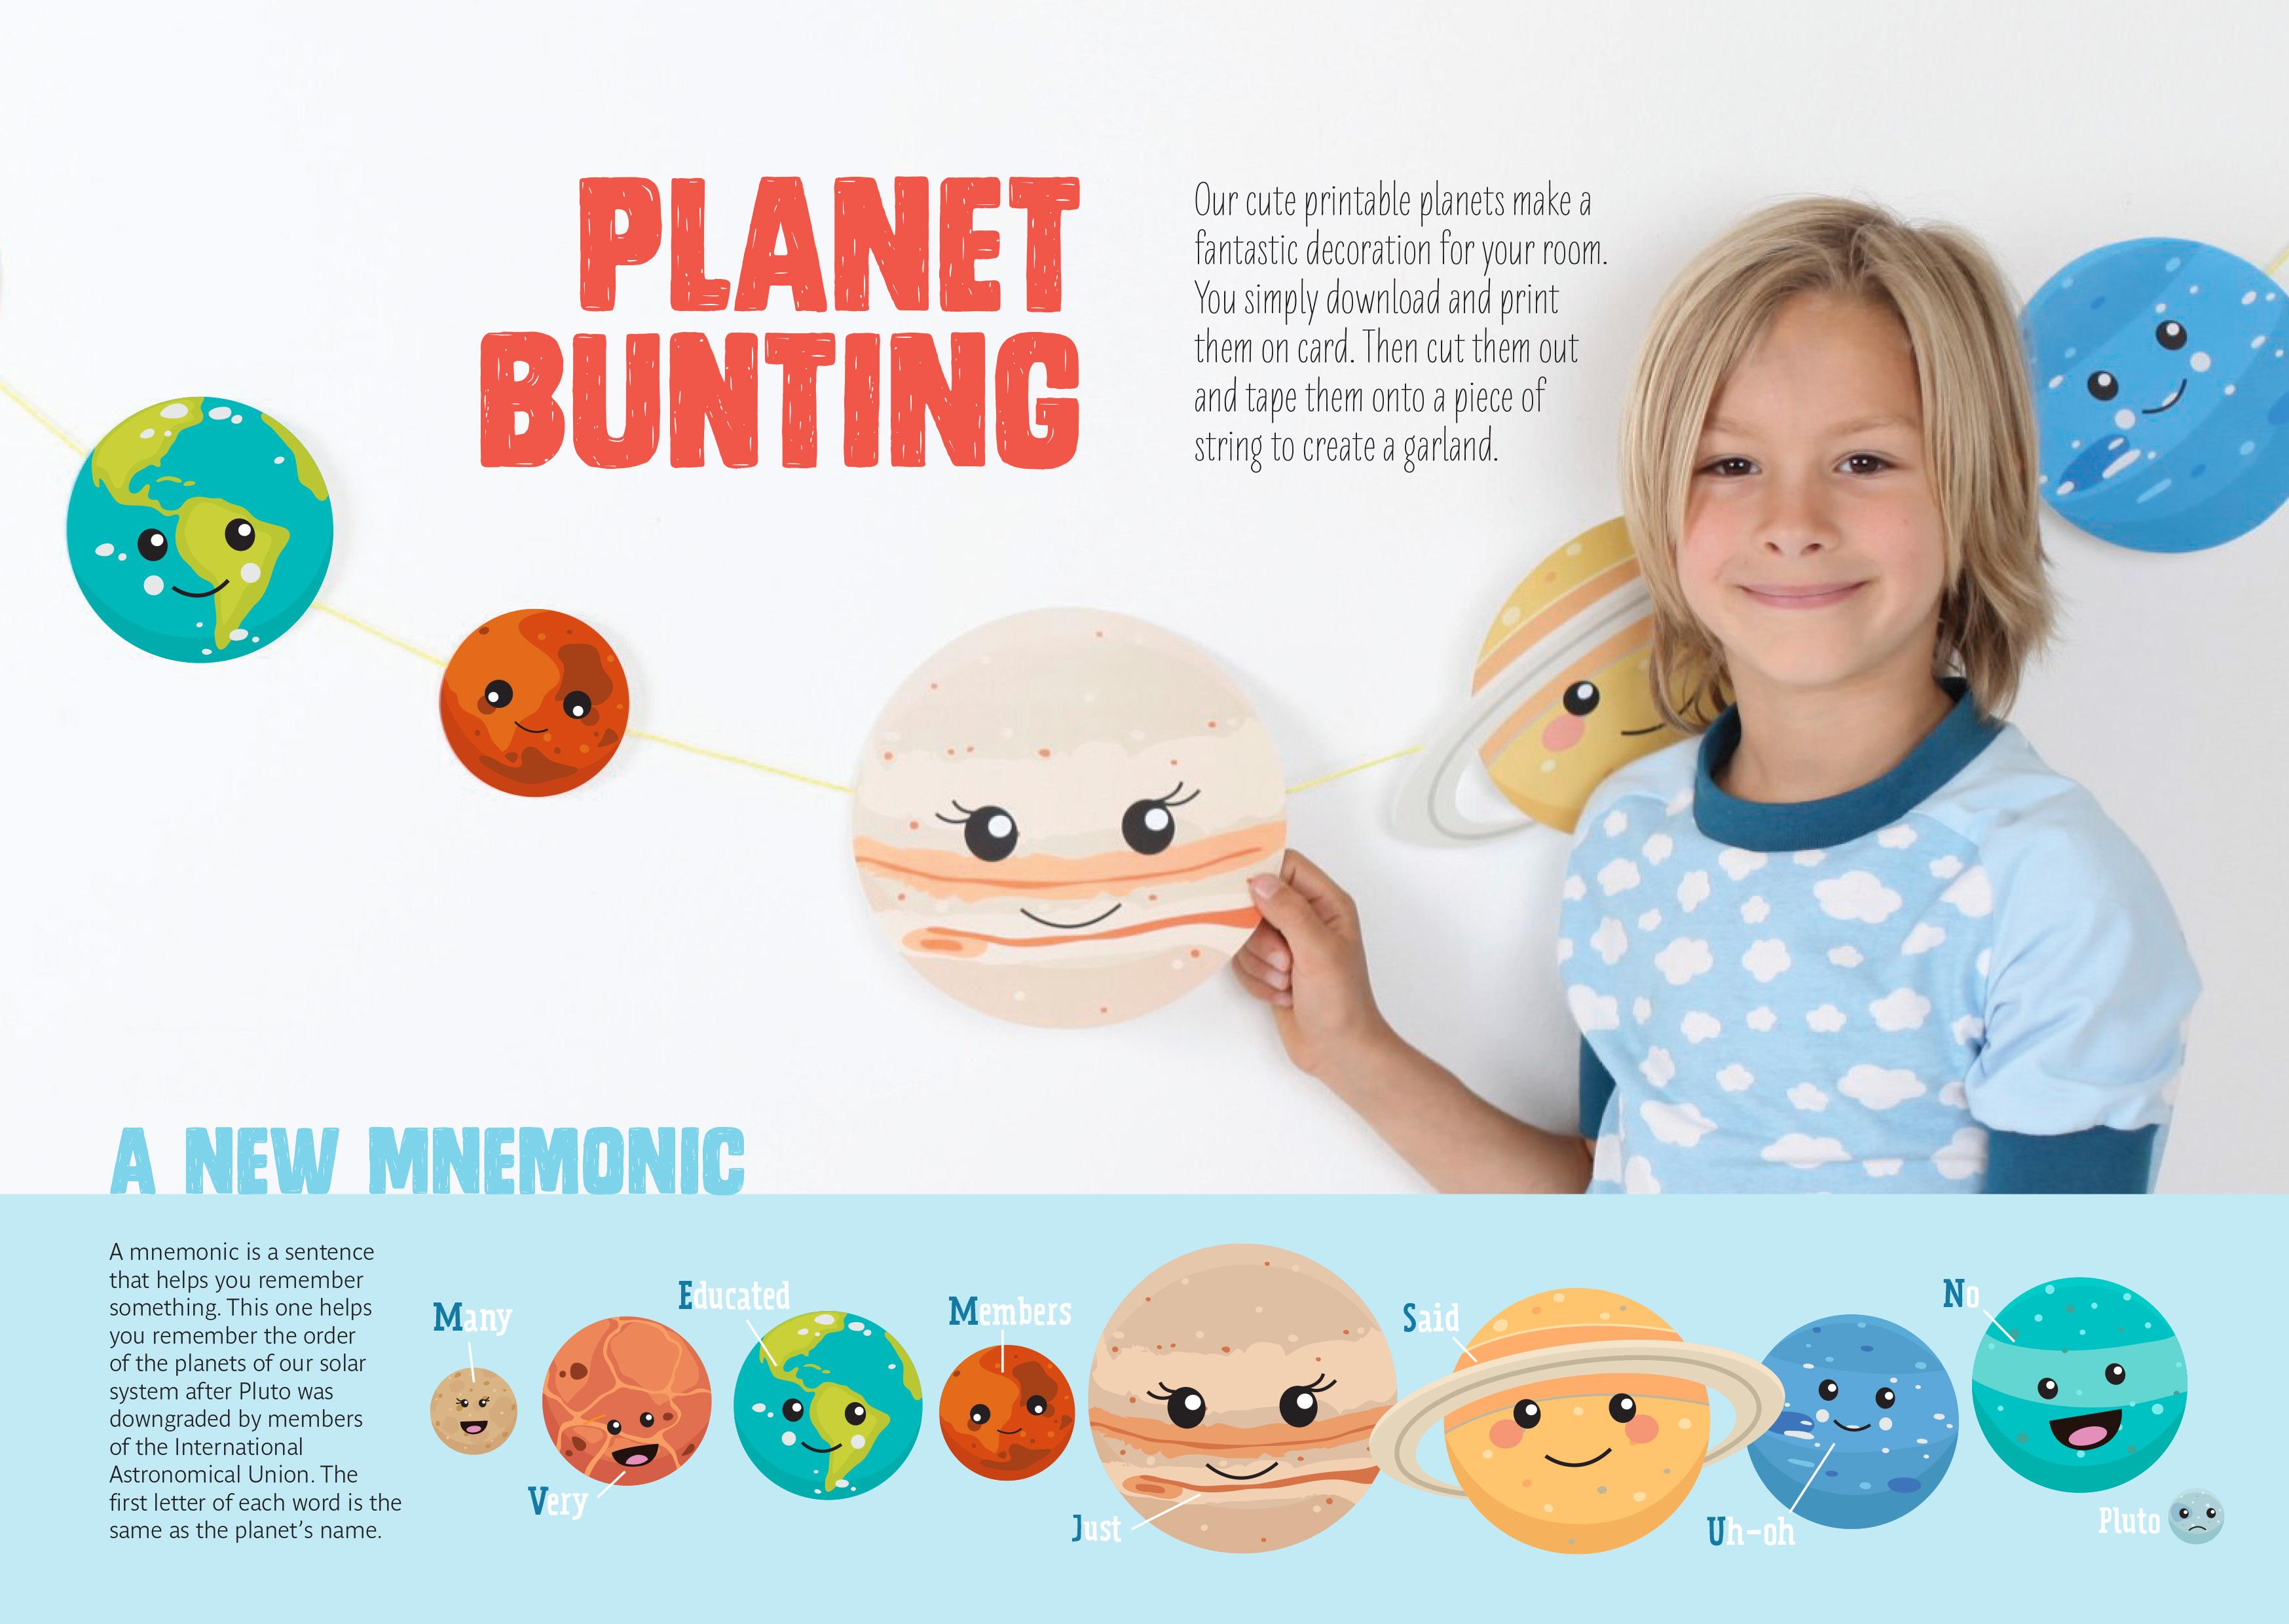 Lotta-planet-bunting